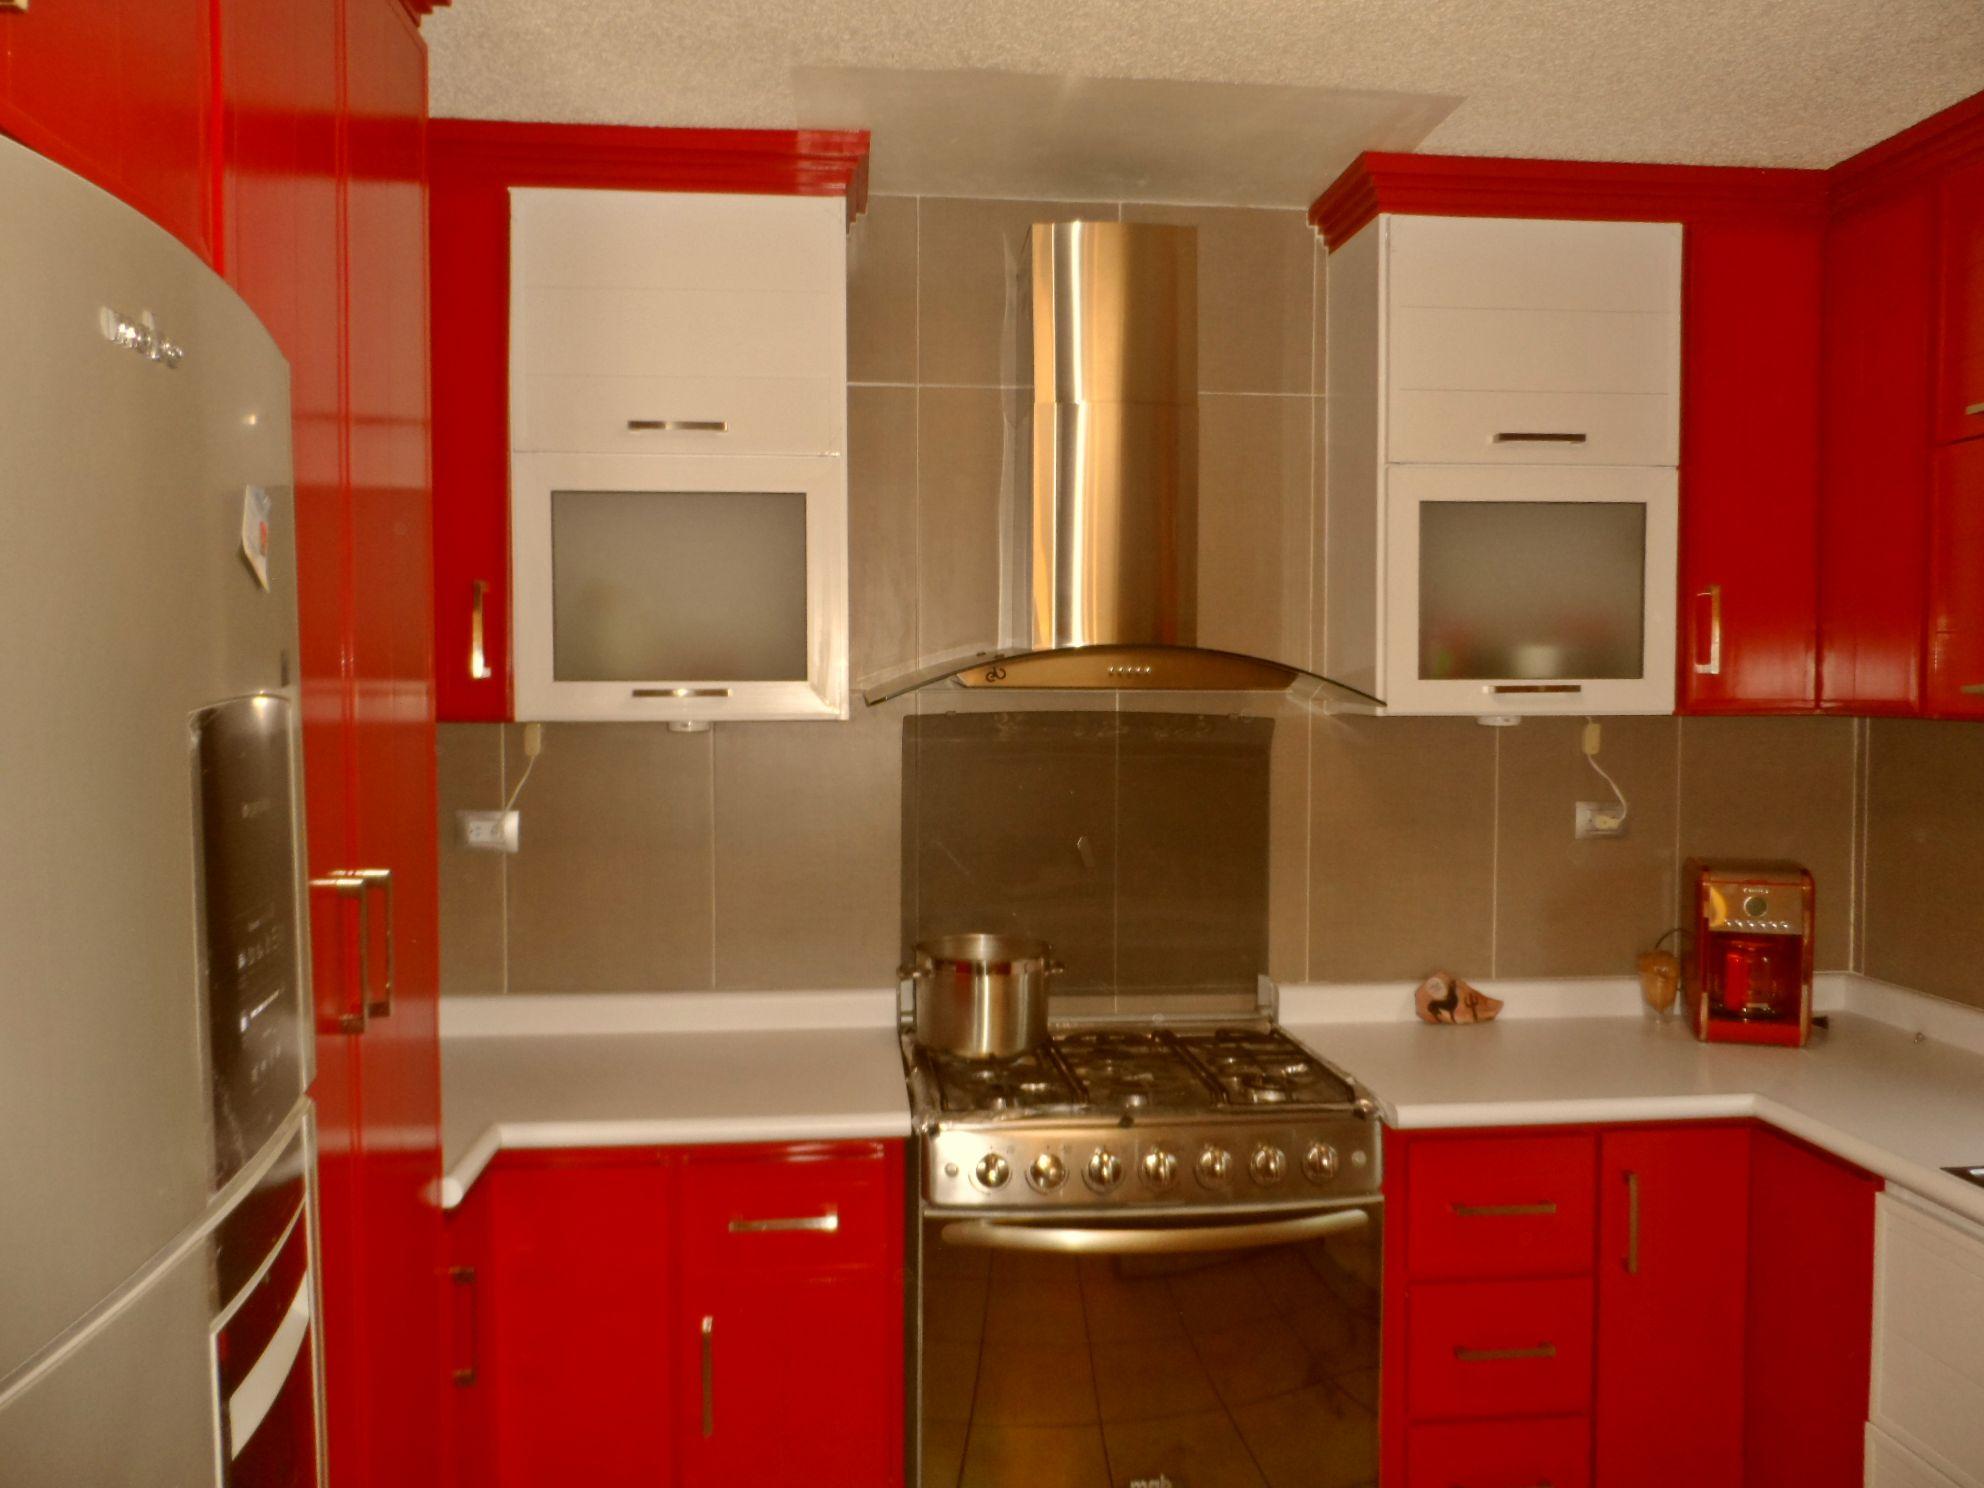 red u shape plastic kitchen cabinets - Plastic Kitchen Cabinet